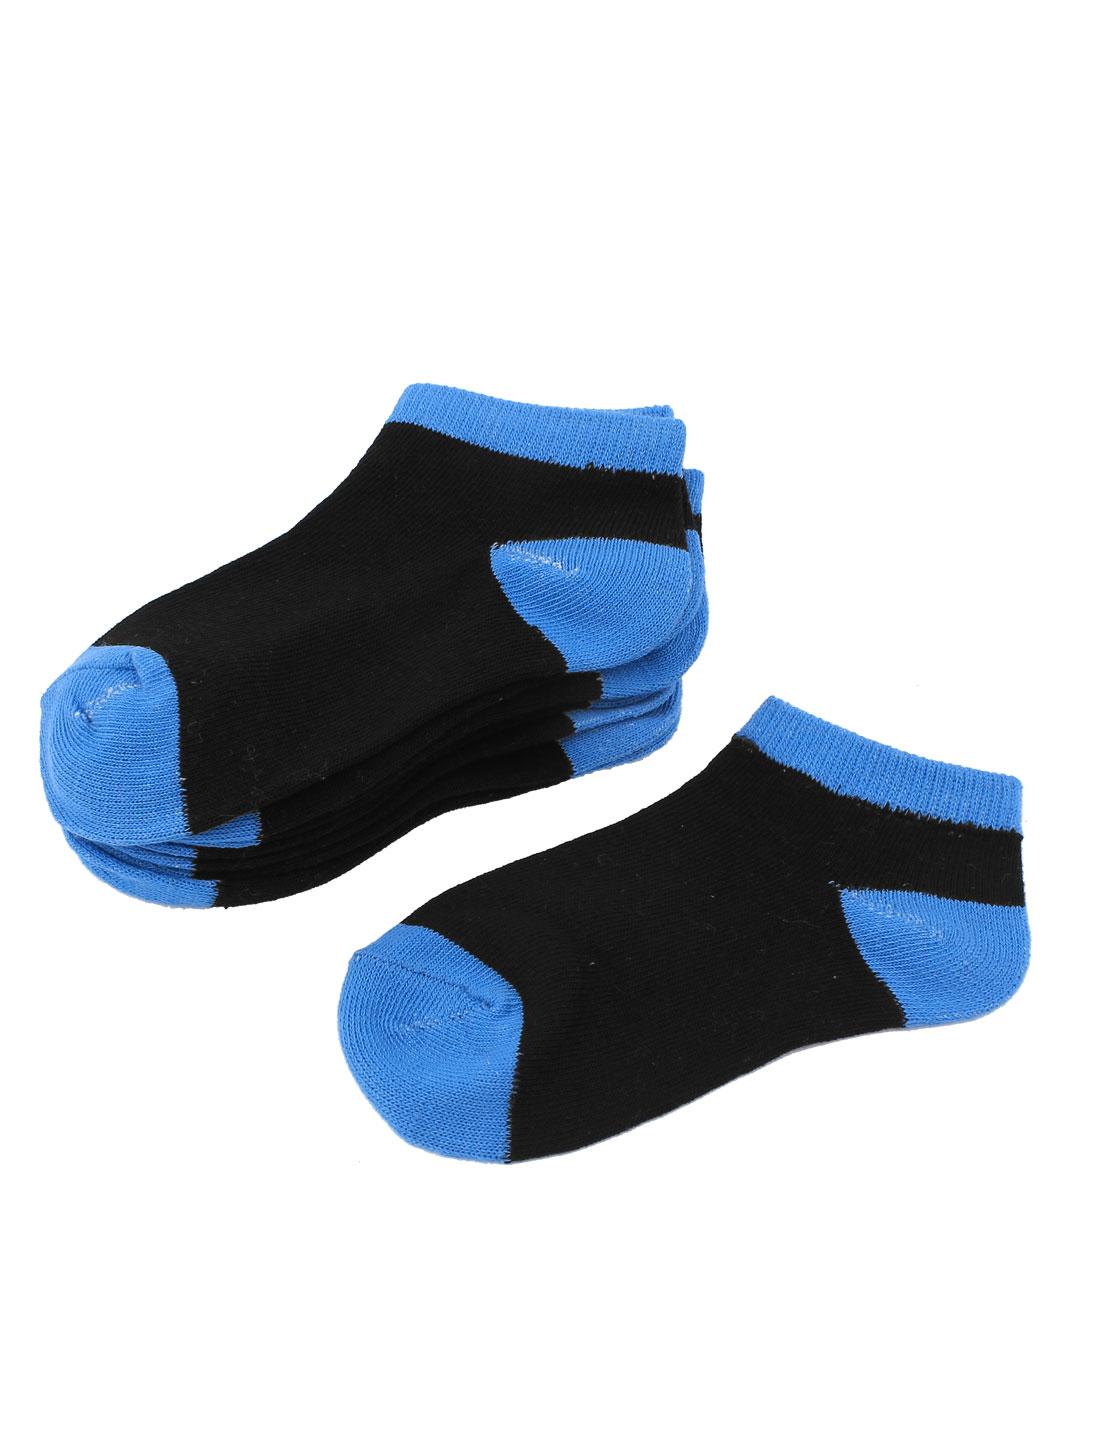 5Pairs Black Blue Cotton Blends Elastic Casual Short Low Cut Heels Hosiery Socks Sockens for Boys